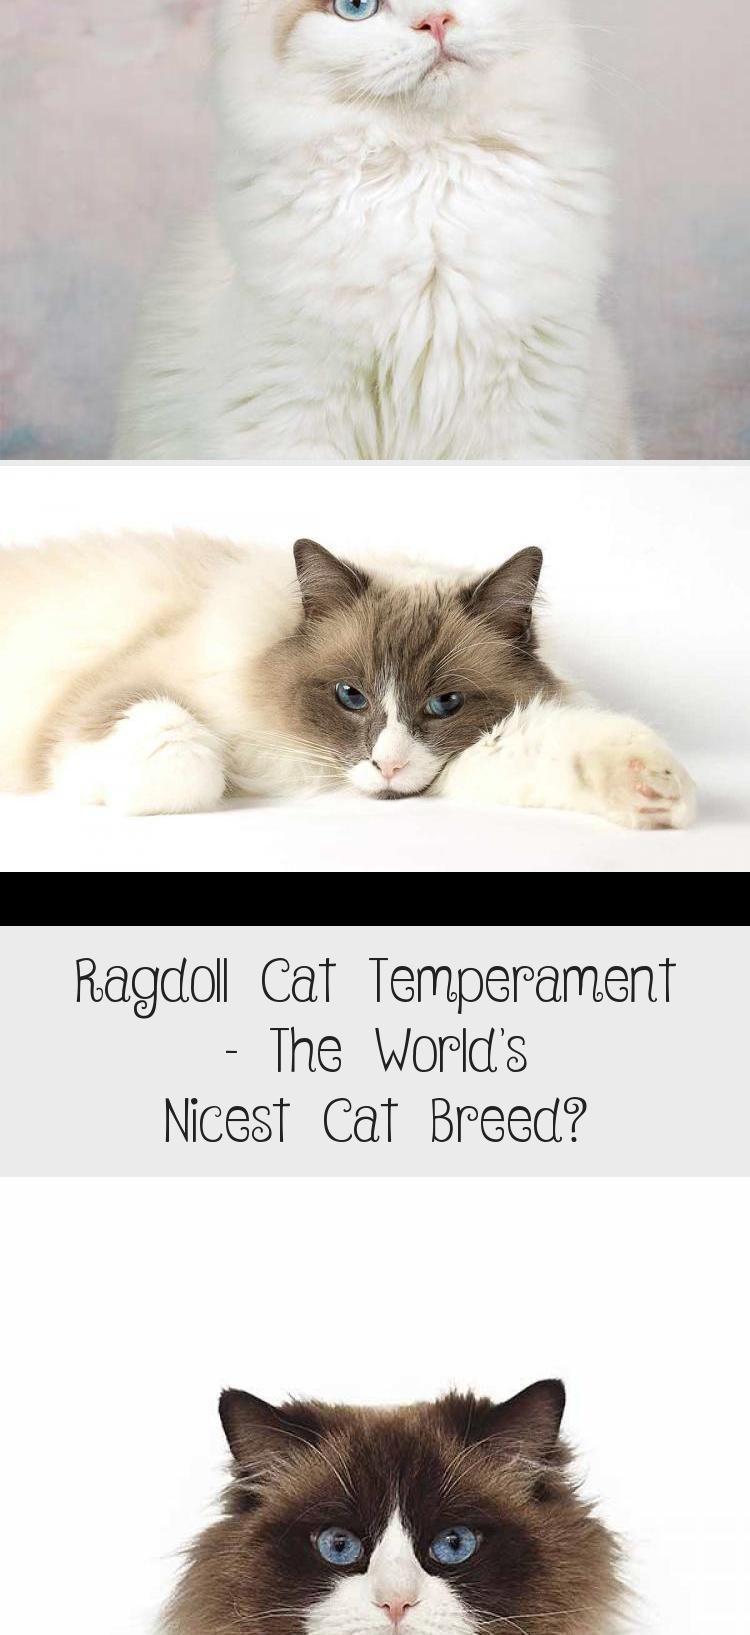 Ragdoll Cat Temperament The World S Nicest Cat Breed Cat Breeds Ragdoll Cat Breed Best Cat Breeds